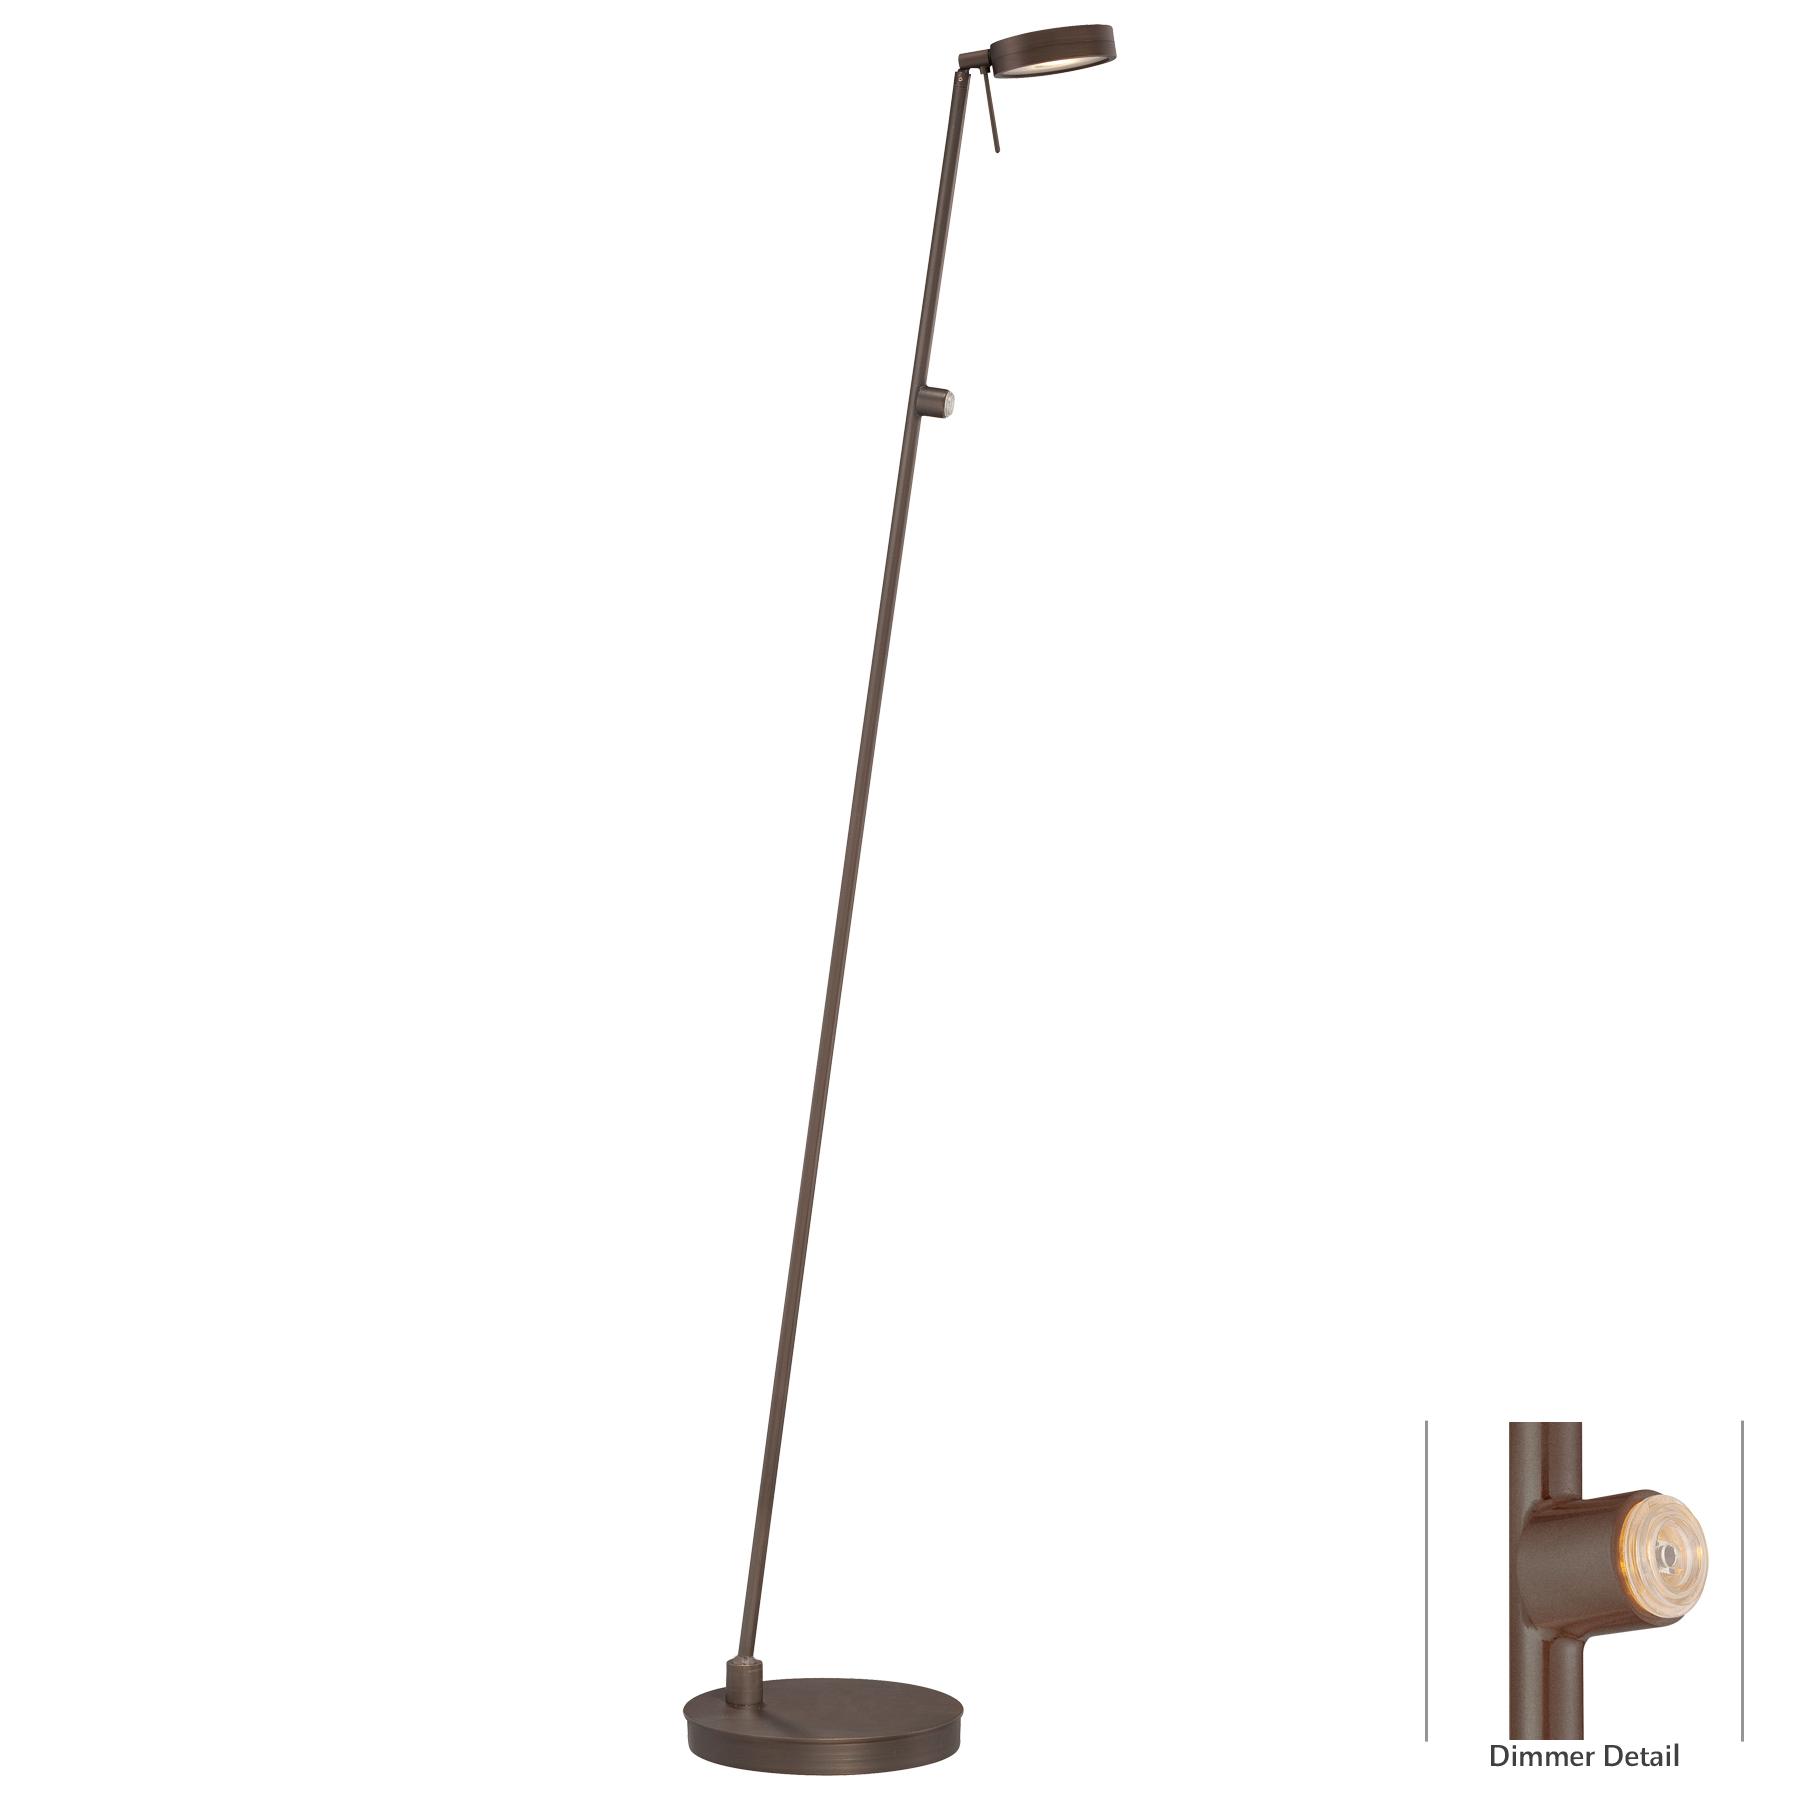 p4304 led pharmacy floor lamp by george kovacs p4304 647. Black Bedroom Furniture Sets. Home Design Ideas